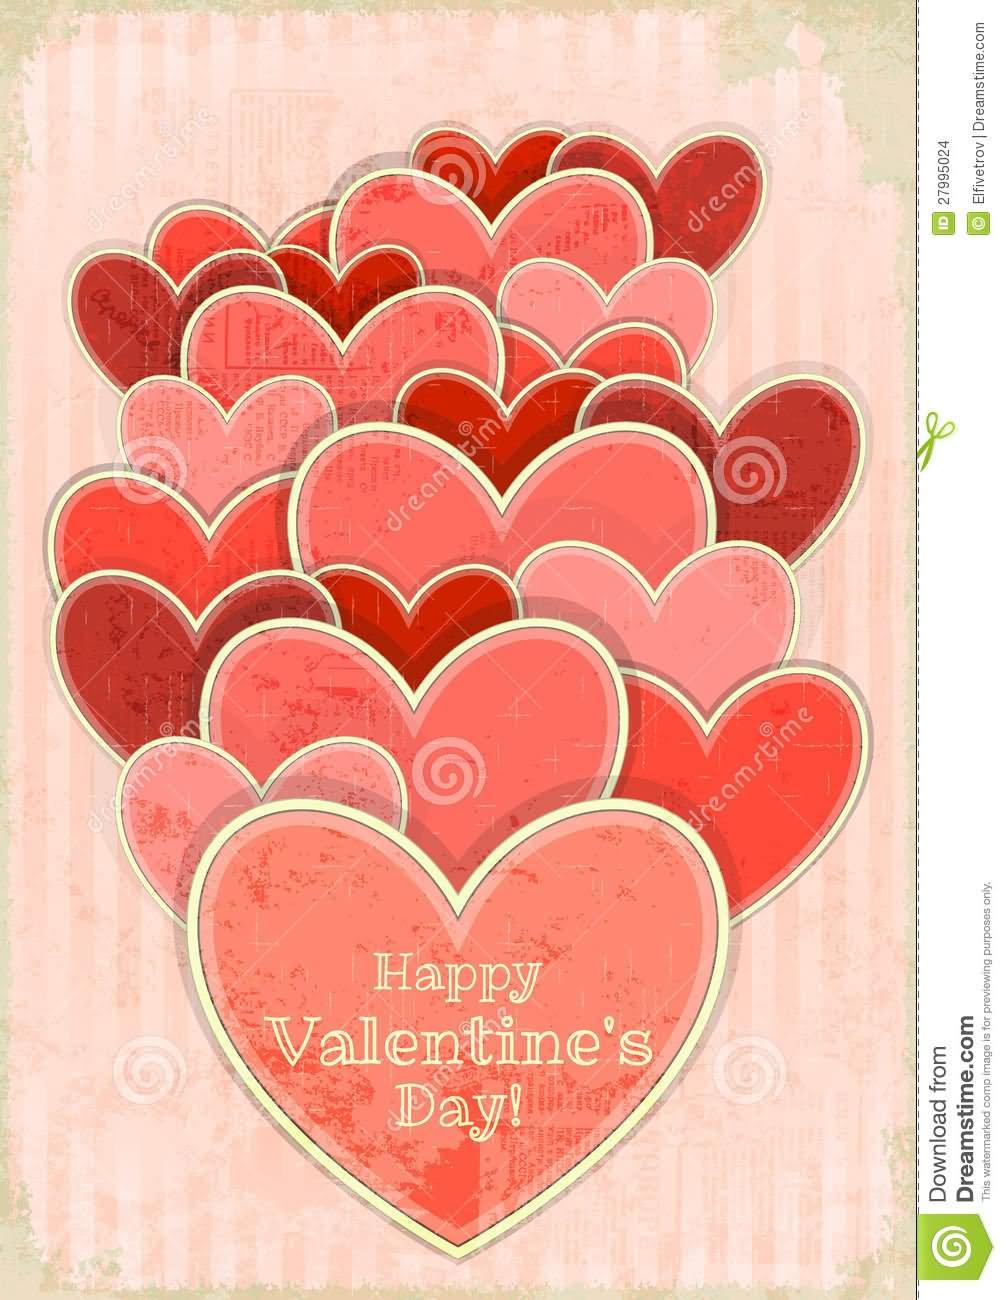 30 Very Best Valentine Day Greeting Cards